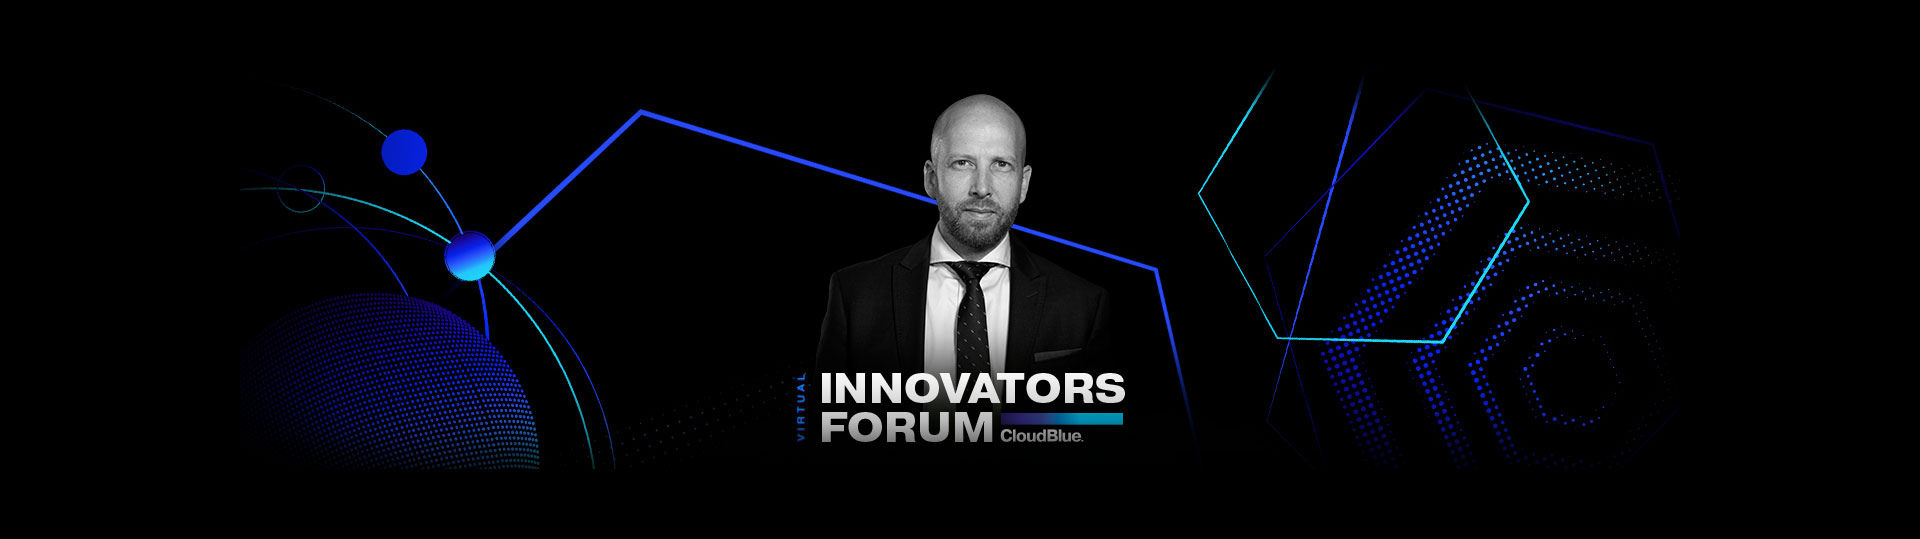 It's a wrap! Reviewing the success of CloudBlue Virtual Innovators Forum 2020